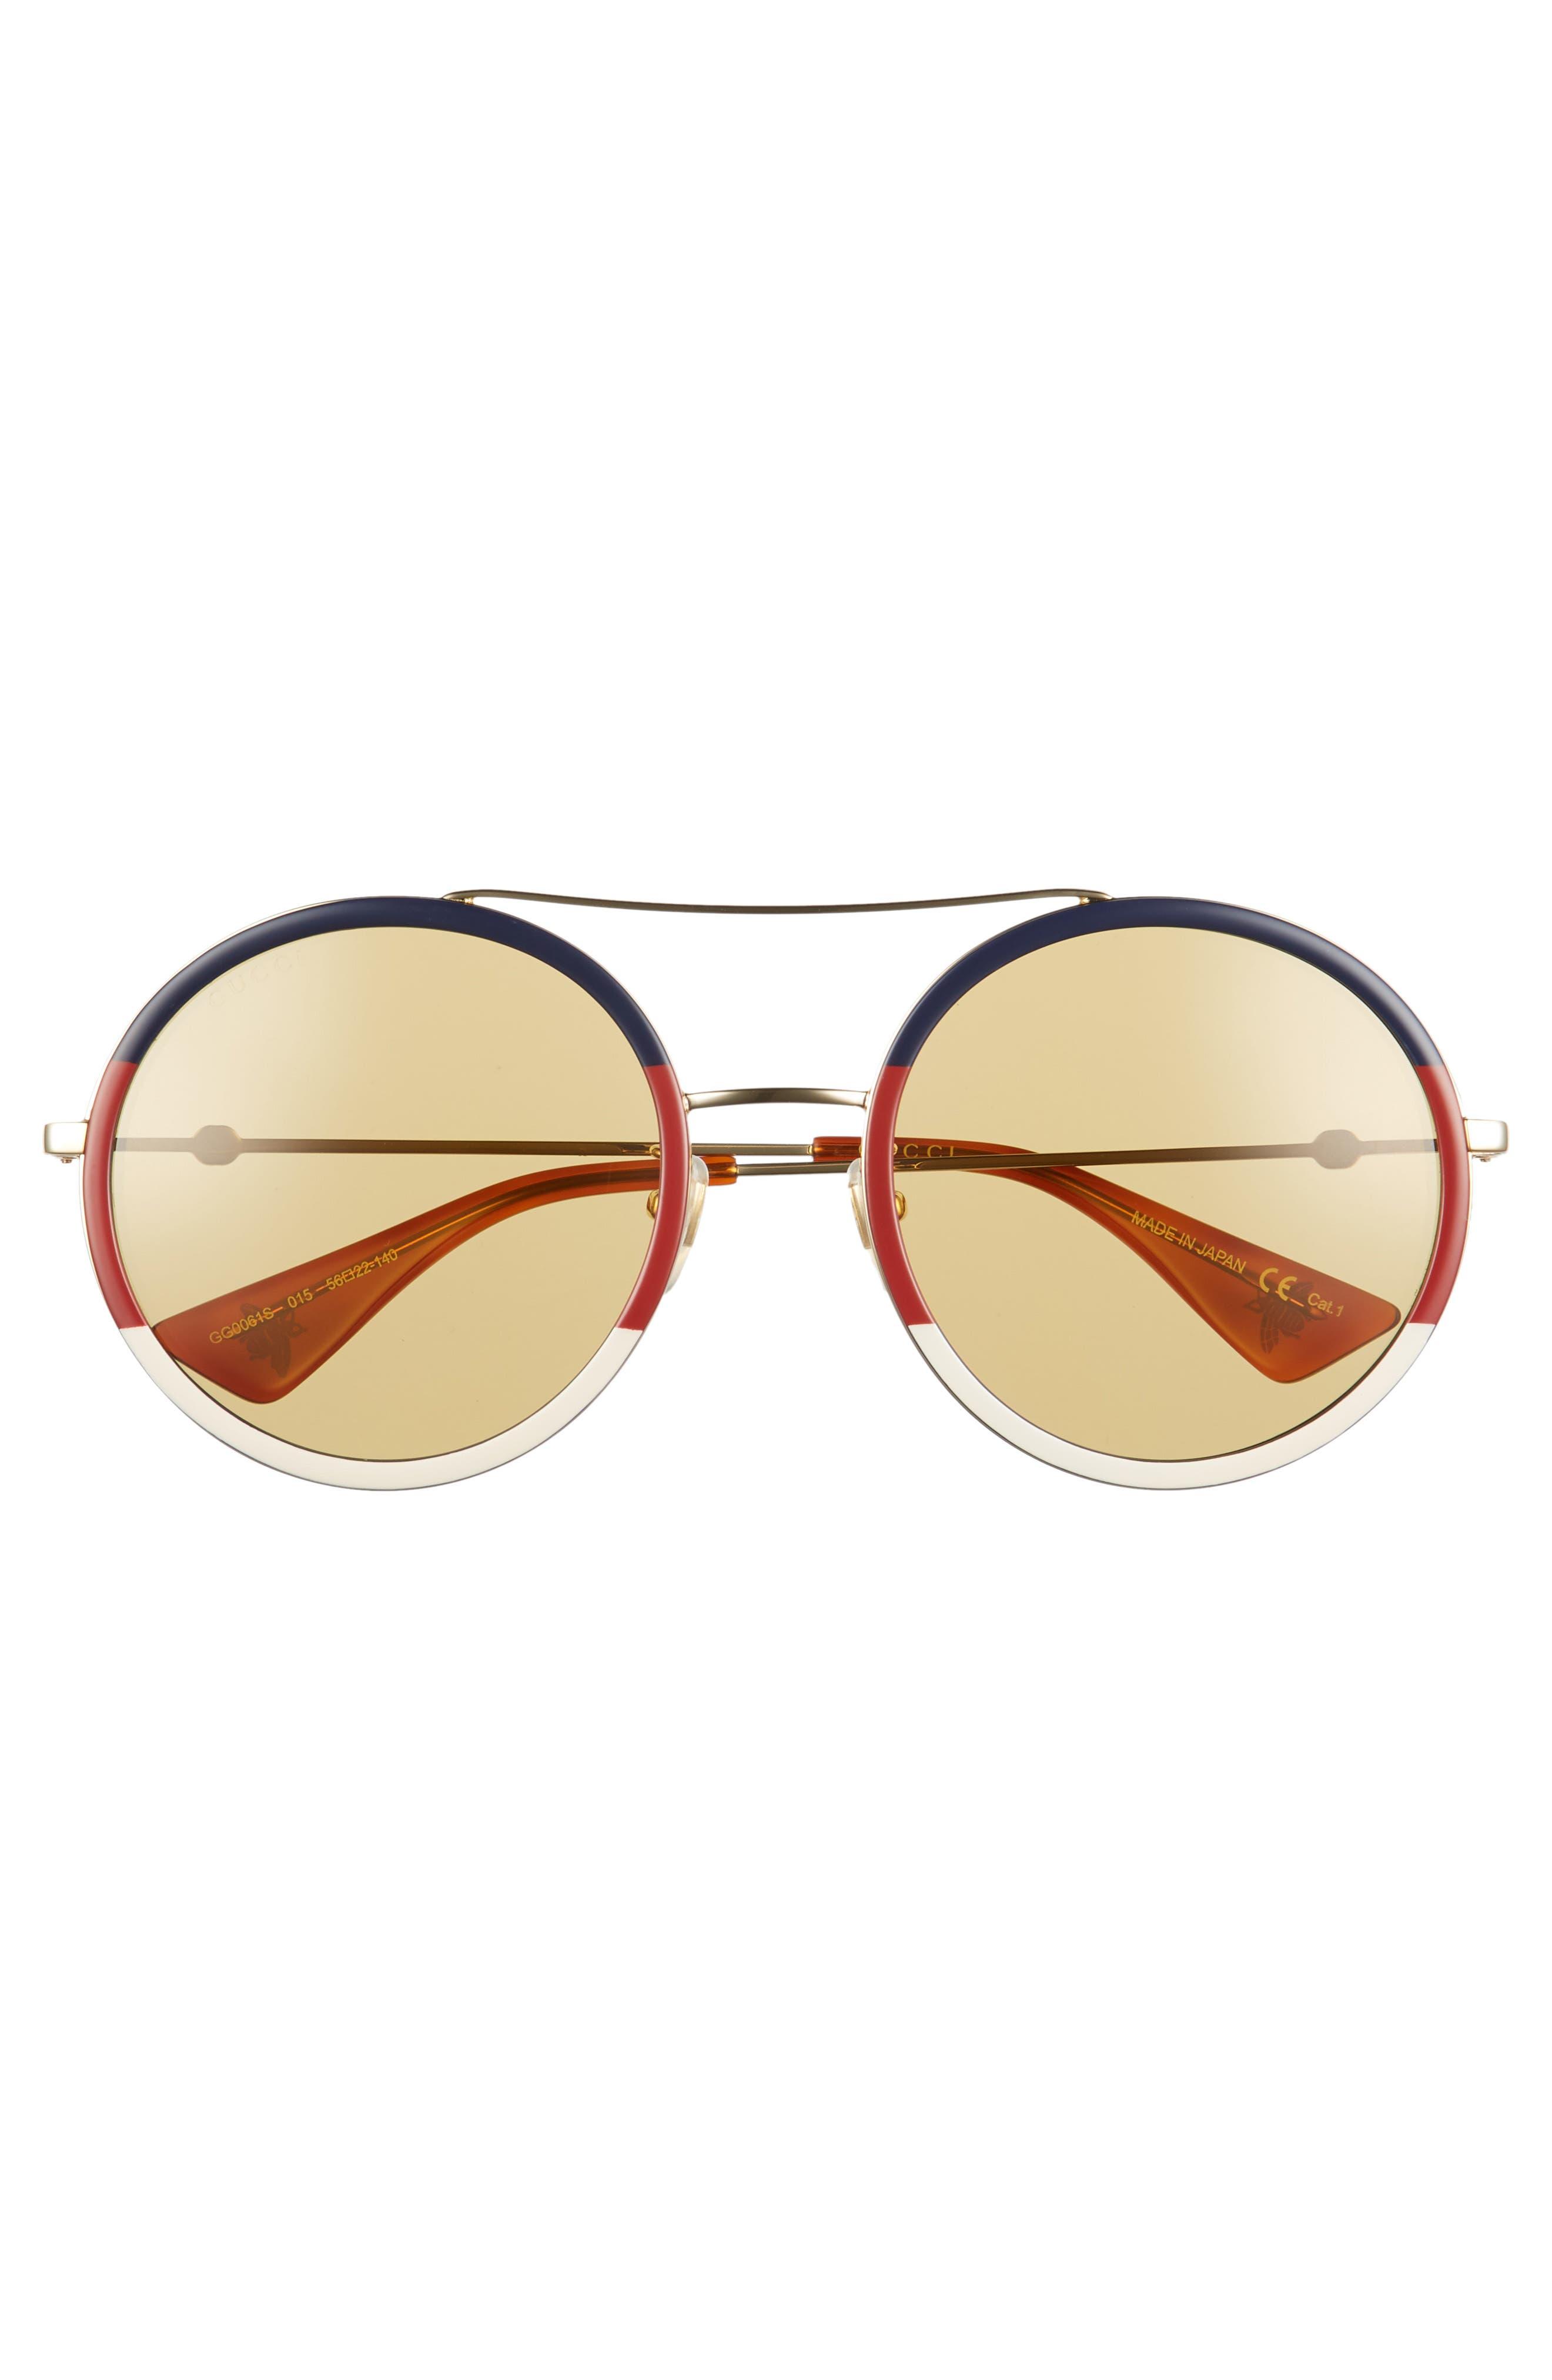 56mm Round Sunglasses,                             Alternate thumbnail 3, color,                             GOLD/ BLONDE HAVANA